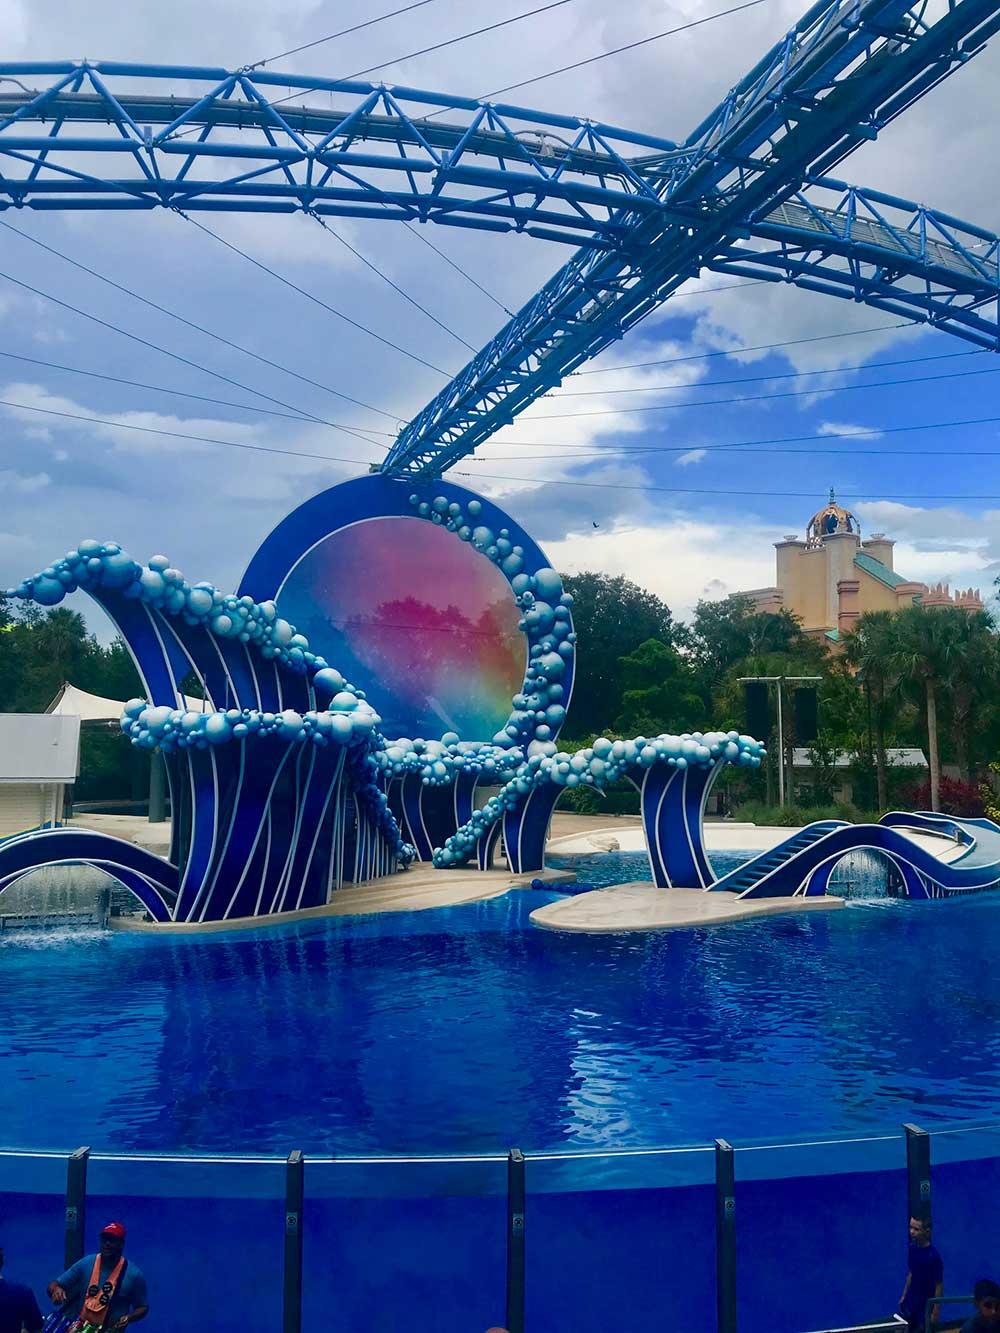 Sea World Orlando Electric Ocean - Touch the Sky